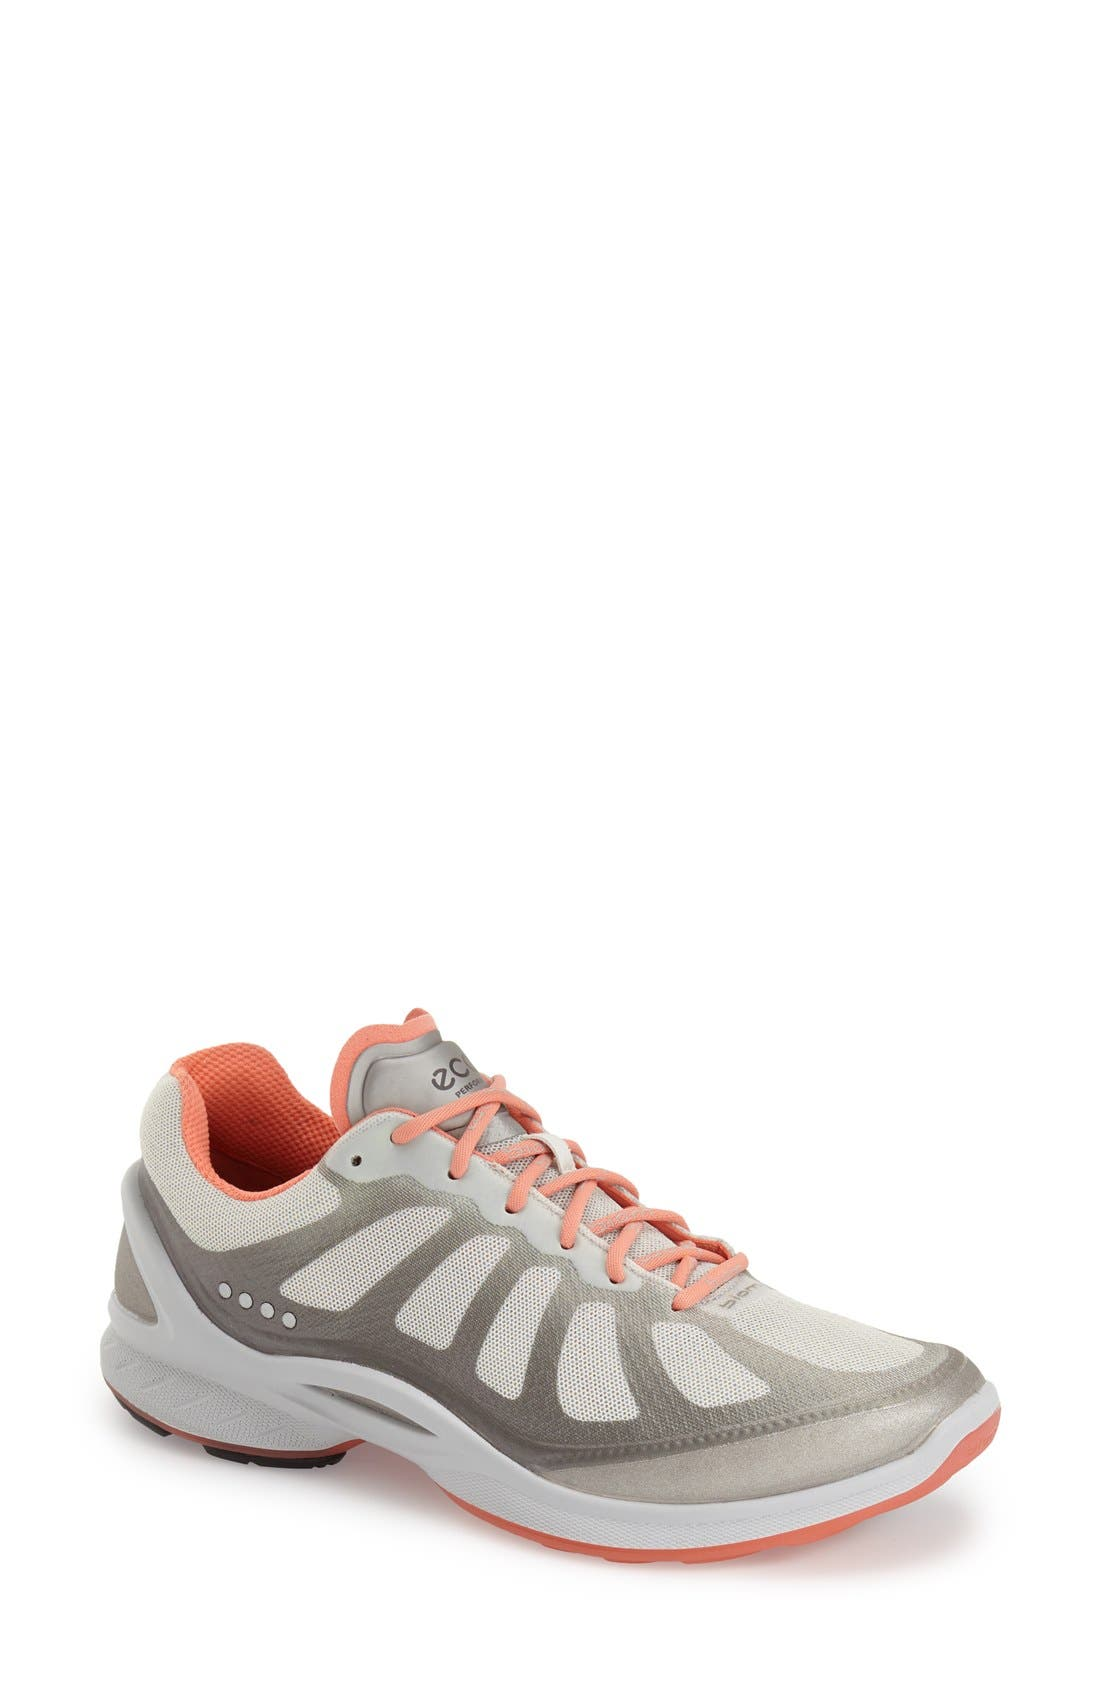 'BIOM Fjuel Racer' Sneaker,                         Main,                         color, SILVER METALLIC CORAL